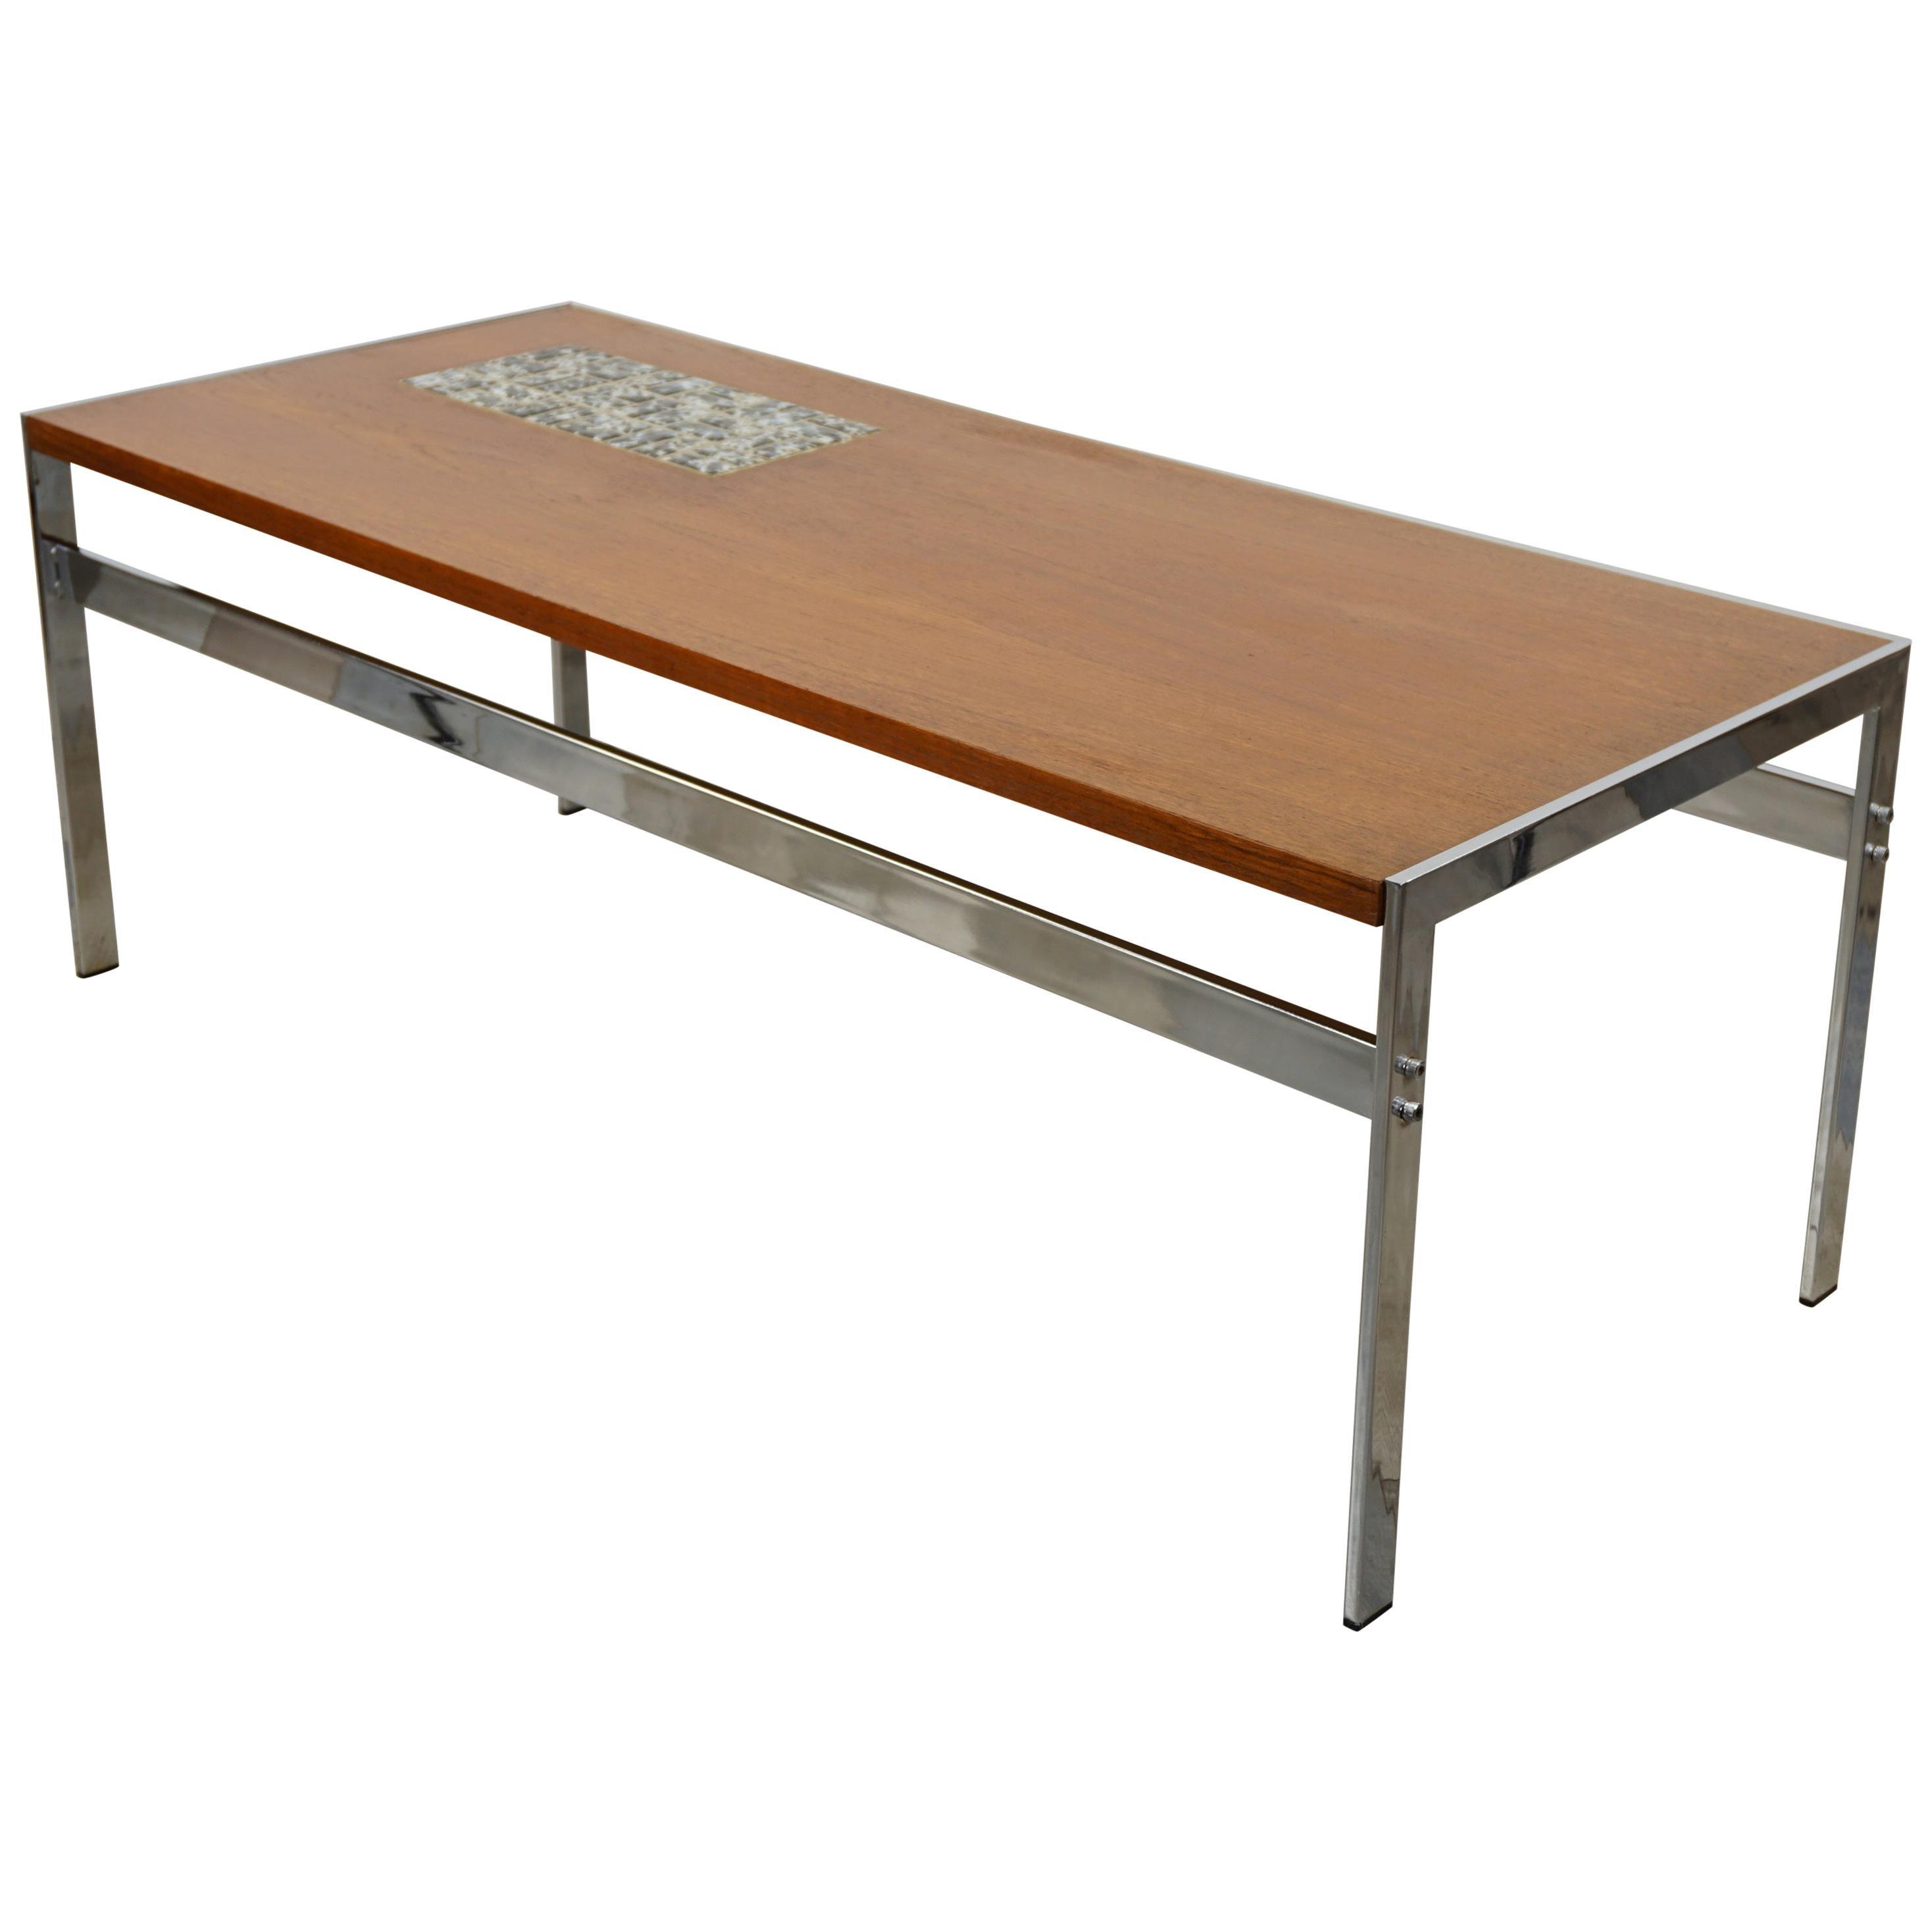 Rectangular 1960s Design Chrome Metal And Teak Wooden Coffee Table